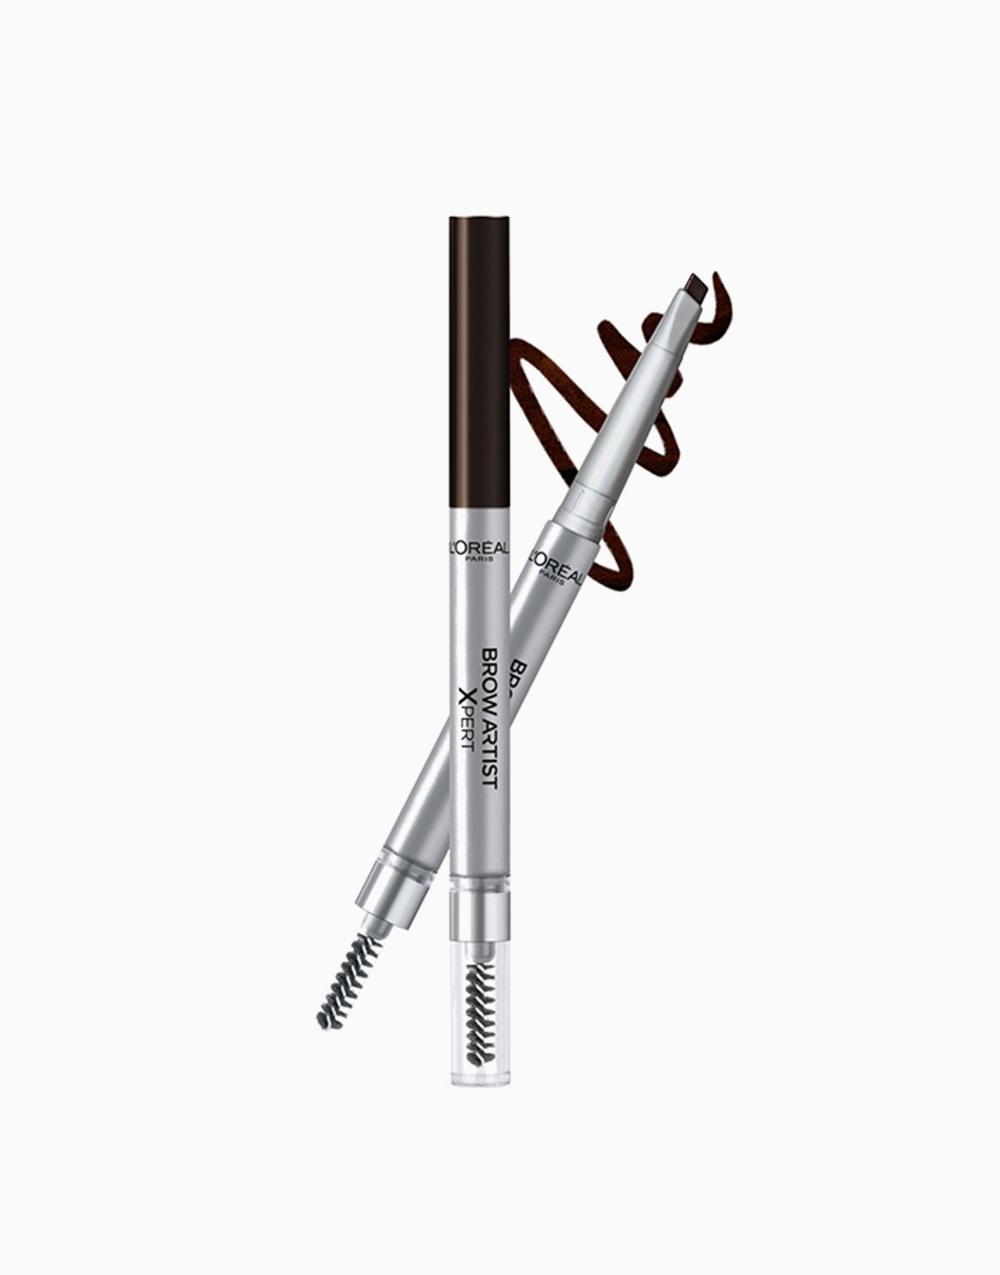 Brow Artist Xpert 2-in-1 Brow Pencil by L'Oréal Paris   109 Ebony